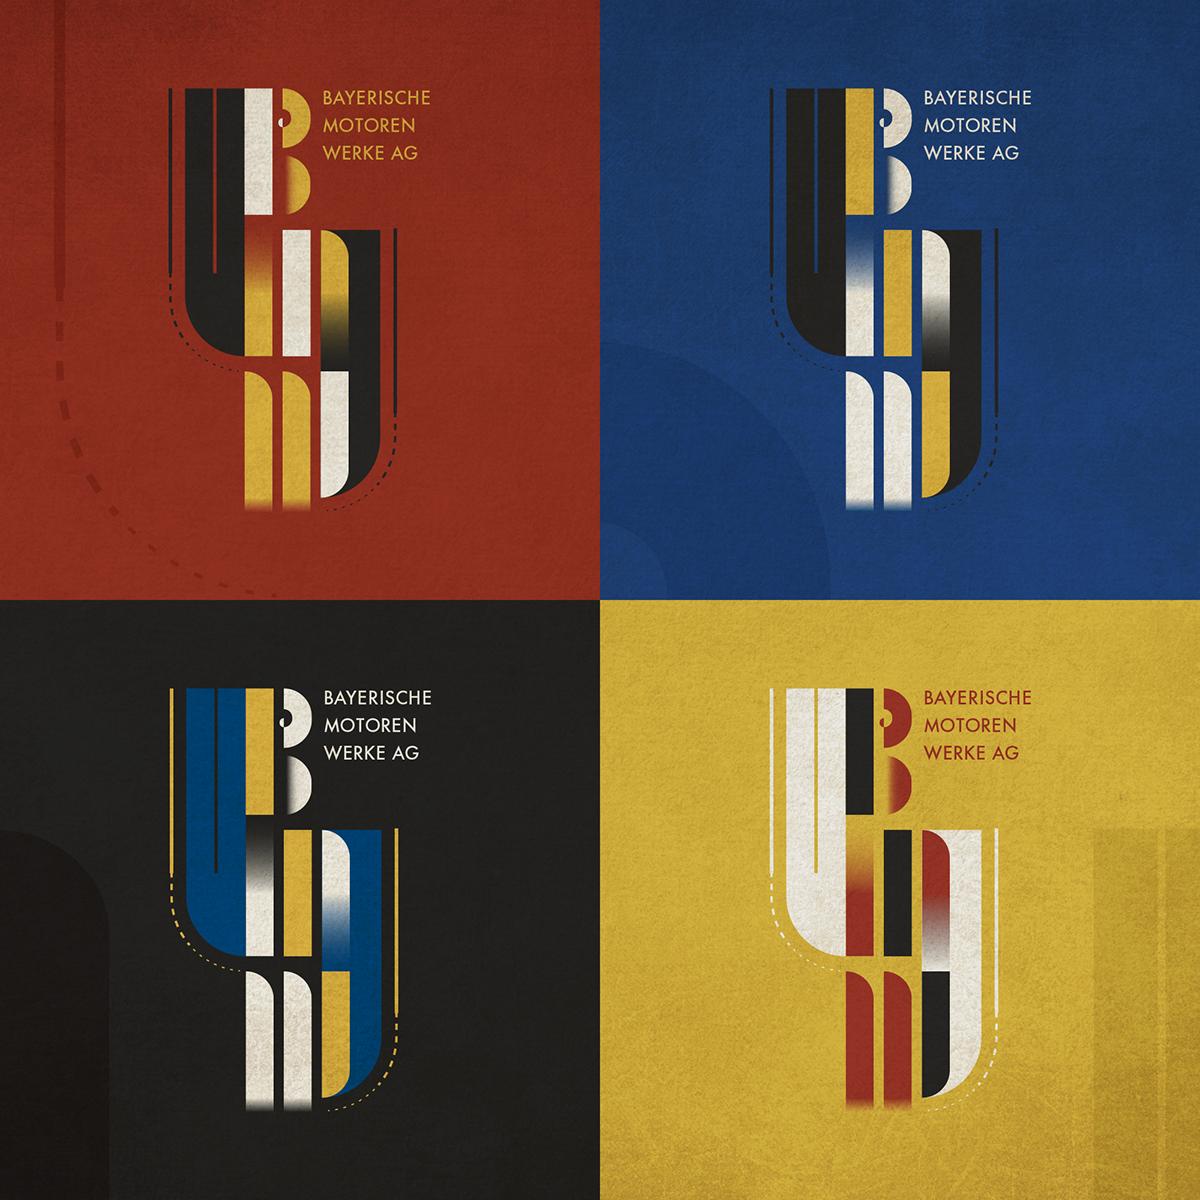 BMW - BAUHAUS Style Logo on Pantone Canvas Gallery